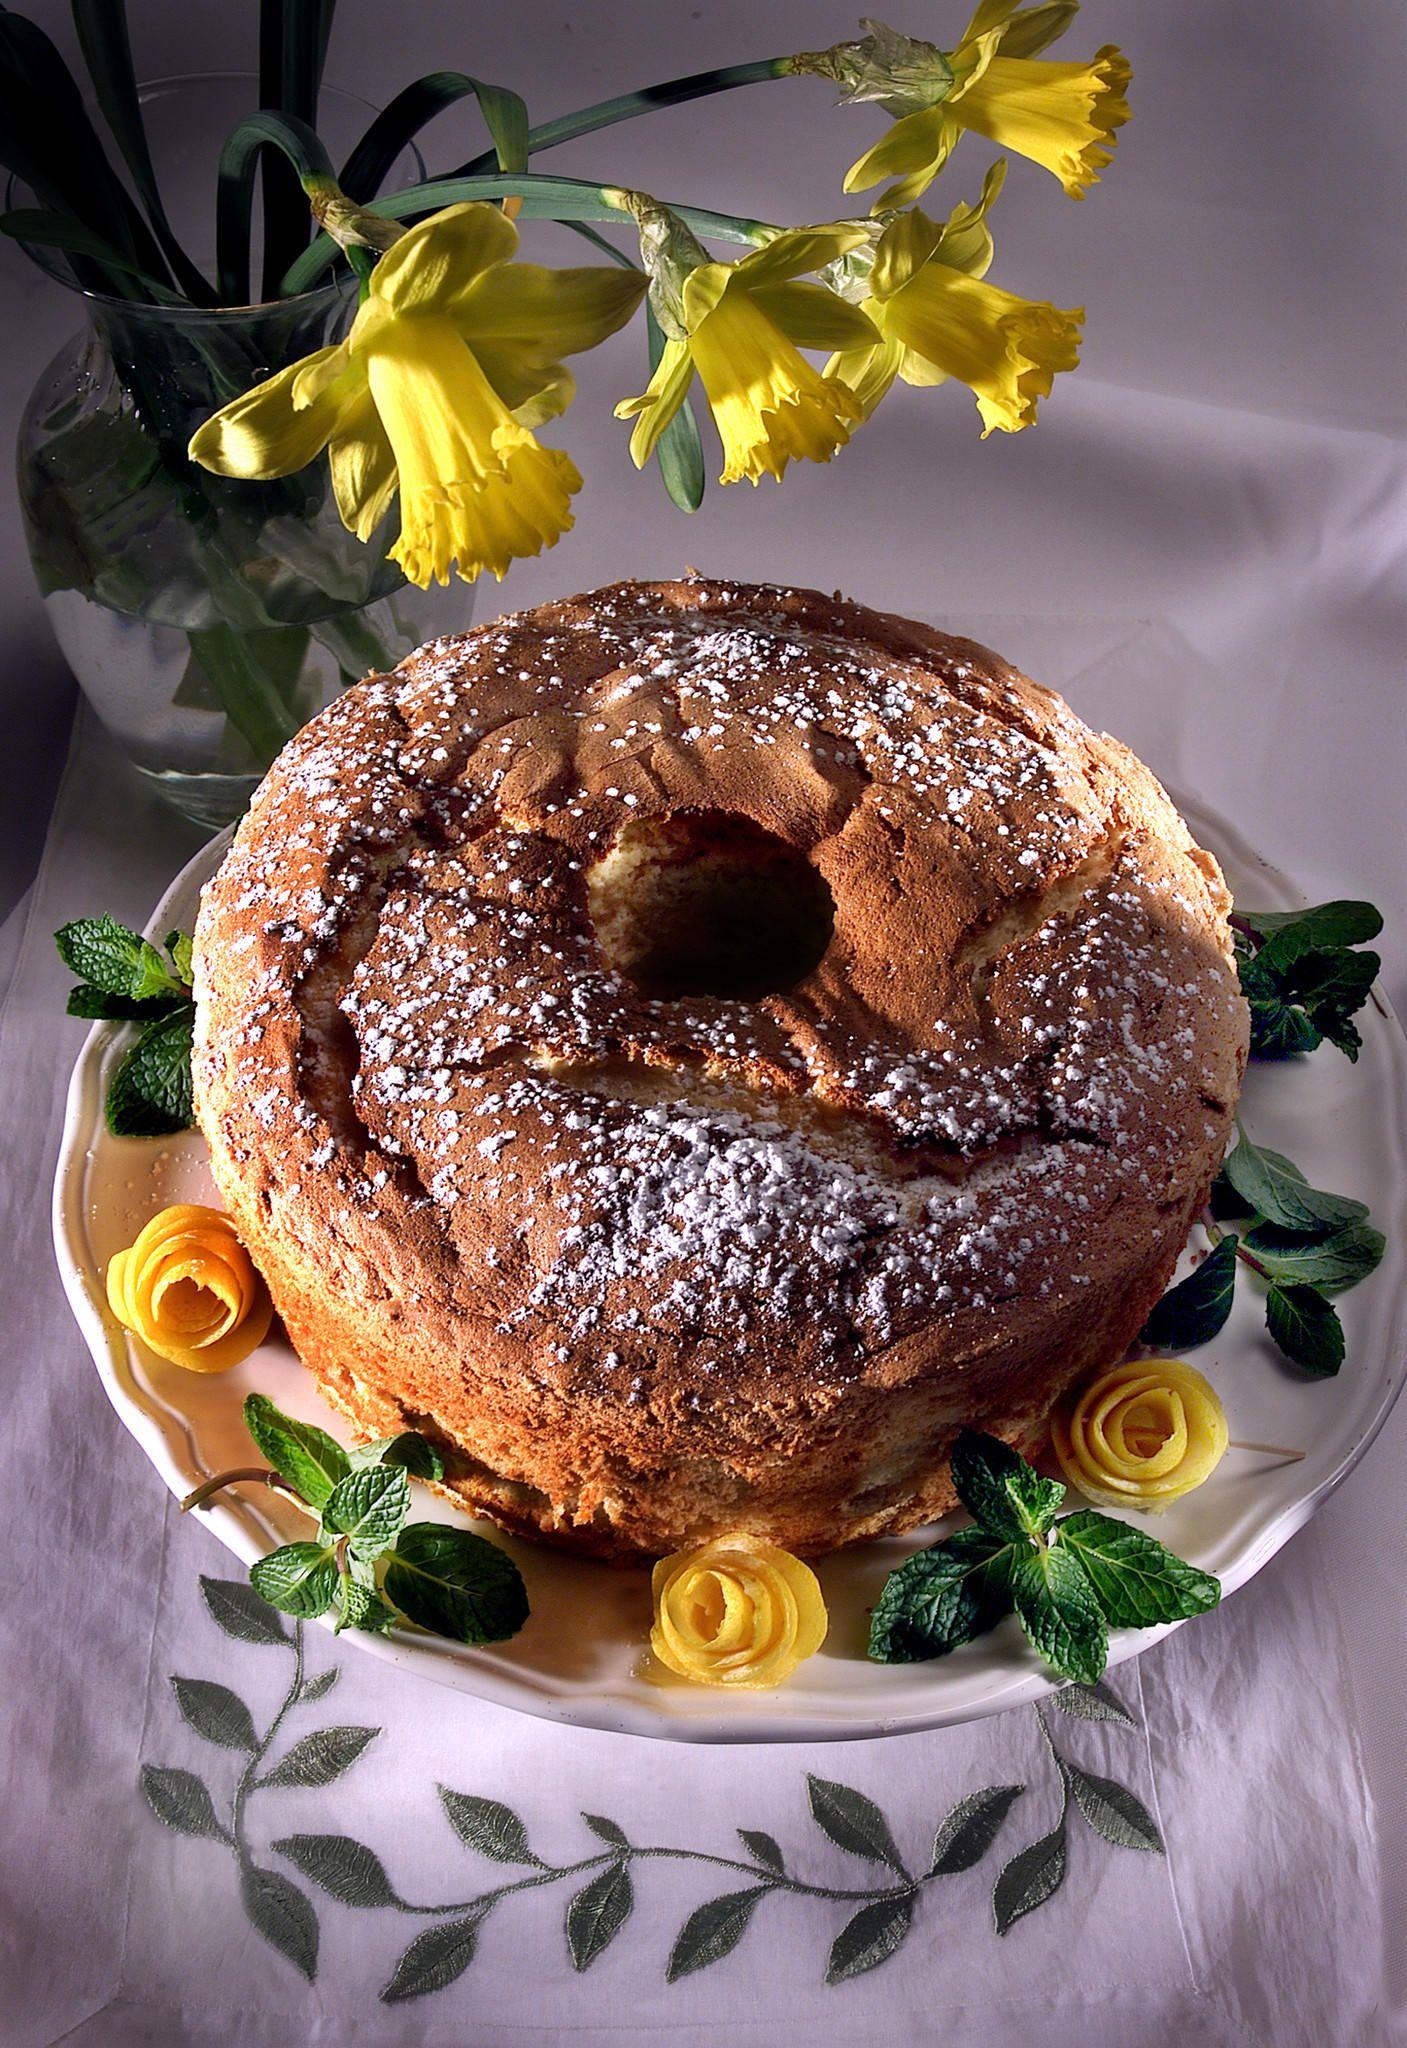 Carole walters passover lemon chiffon cake recipe in